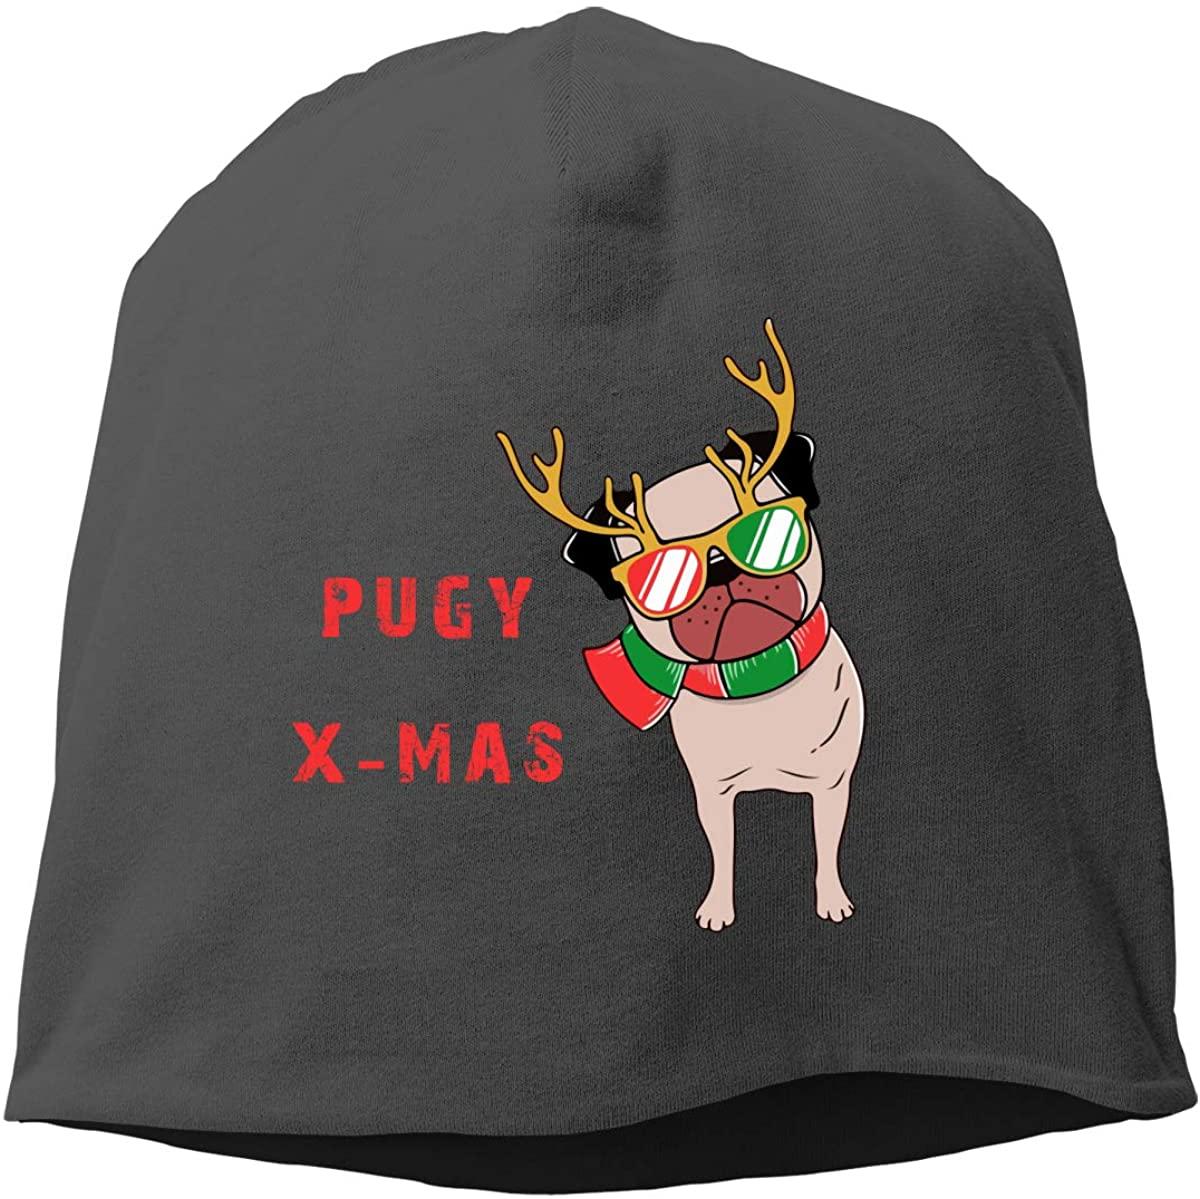 allgobee Slouchy Beanie Funny Santa Pug Baggy Unisex Skull Cap Summer Winter Acrylic Knit Hat Black